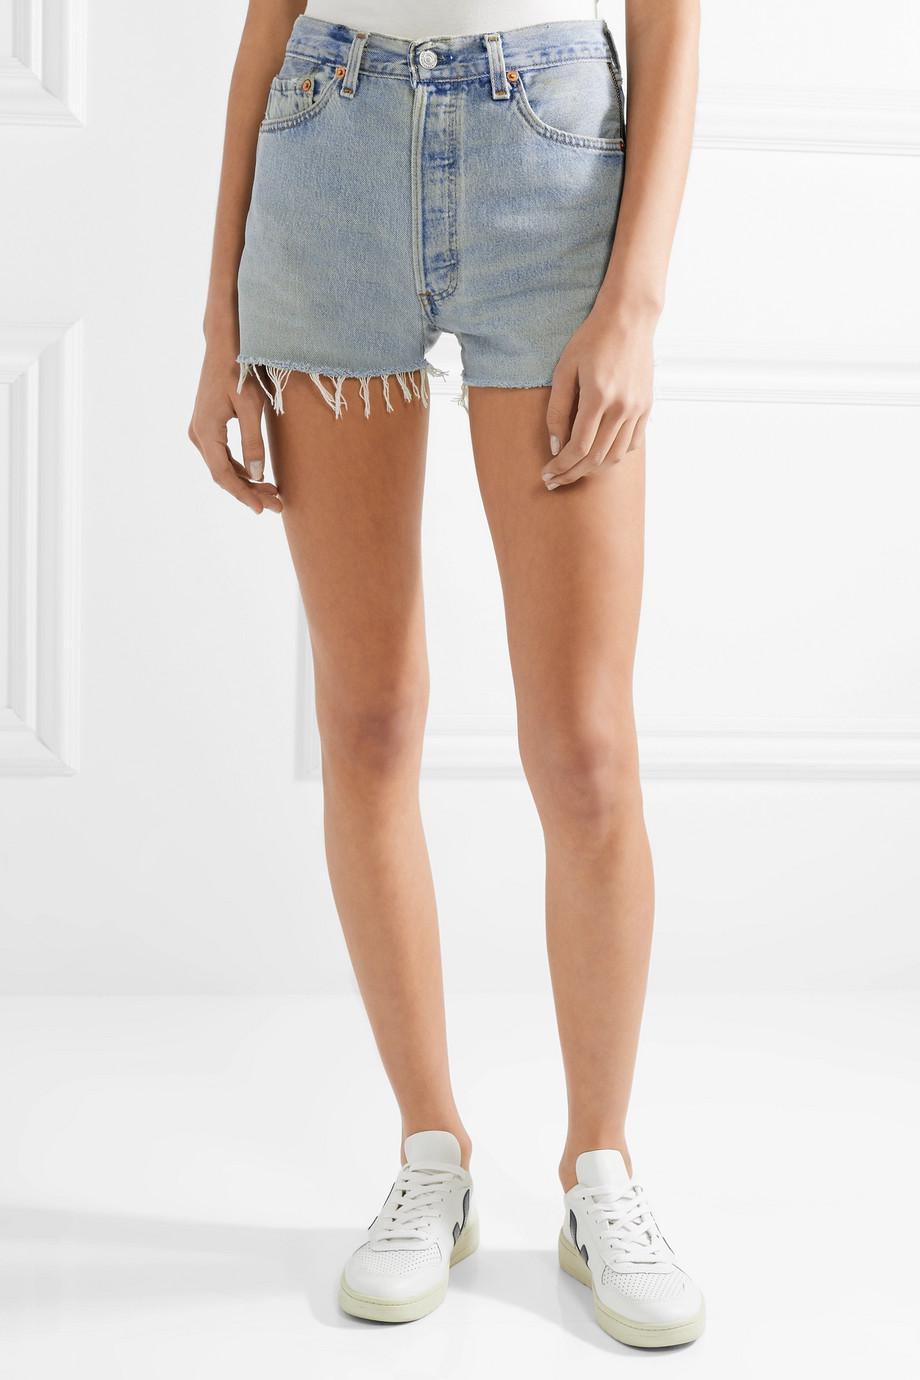 + Levis Zip-embellished Frayed Denim Shorts - Light denim Re/Done G7X9Xkx7